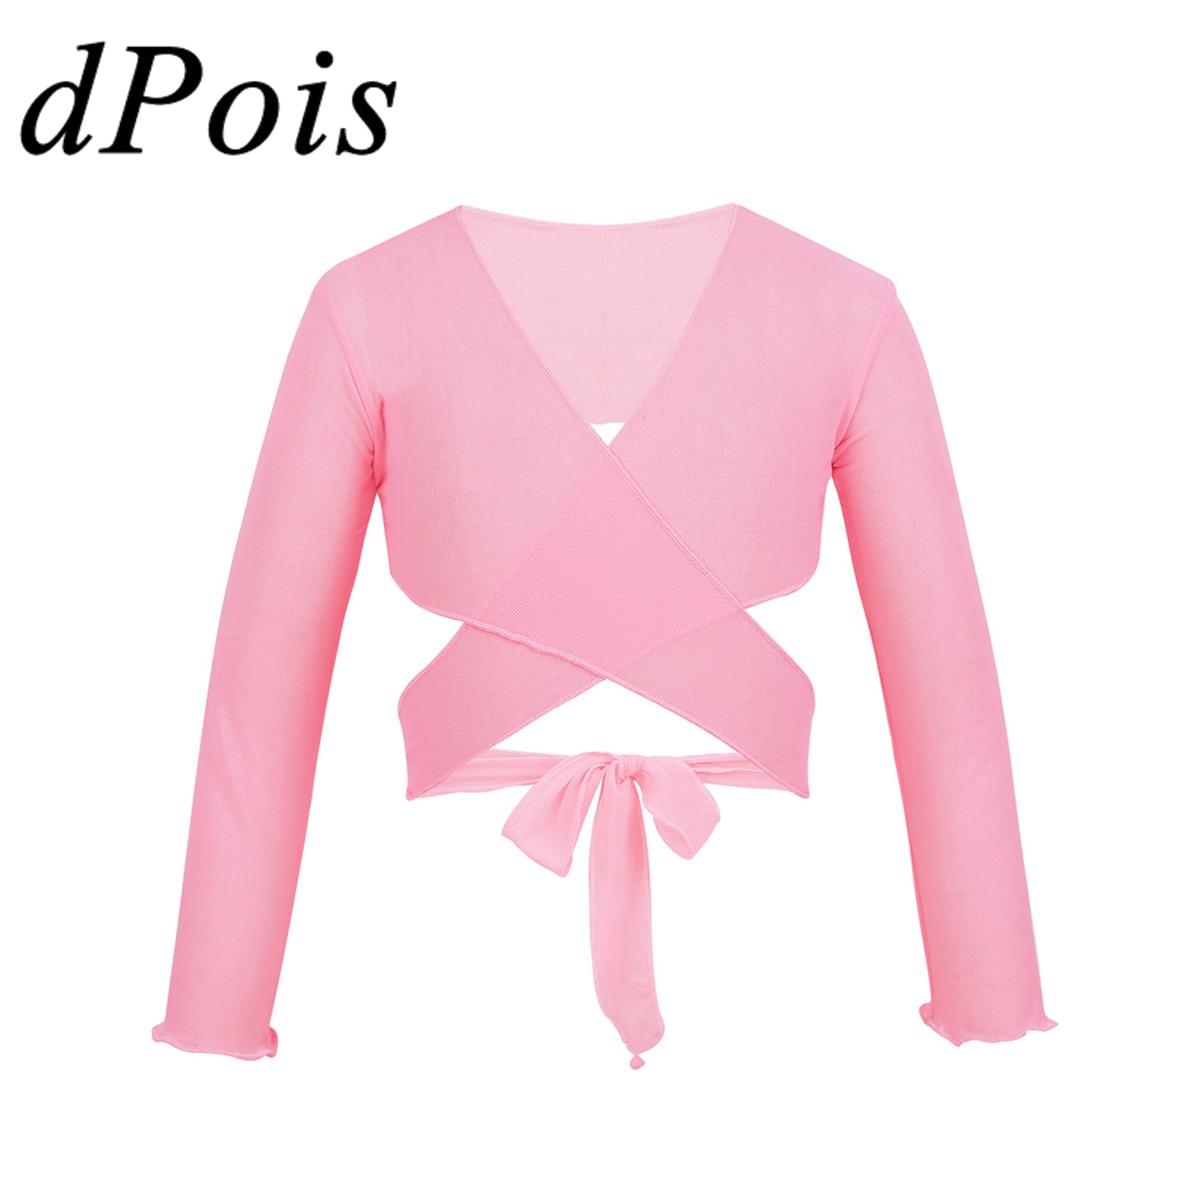 Gymnastic Leotards Jacket Cardigan Dance-Costume Ballet-Wrap Long-Sleeve Girls Kids Top